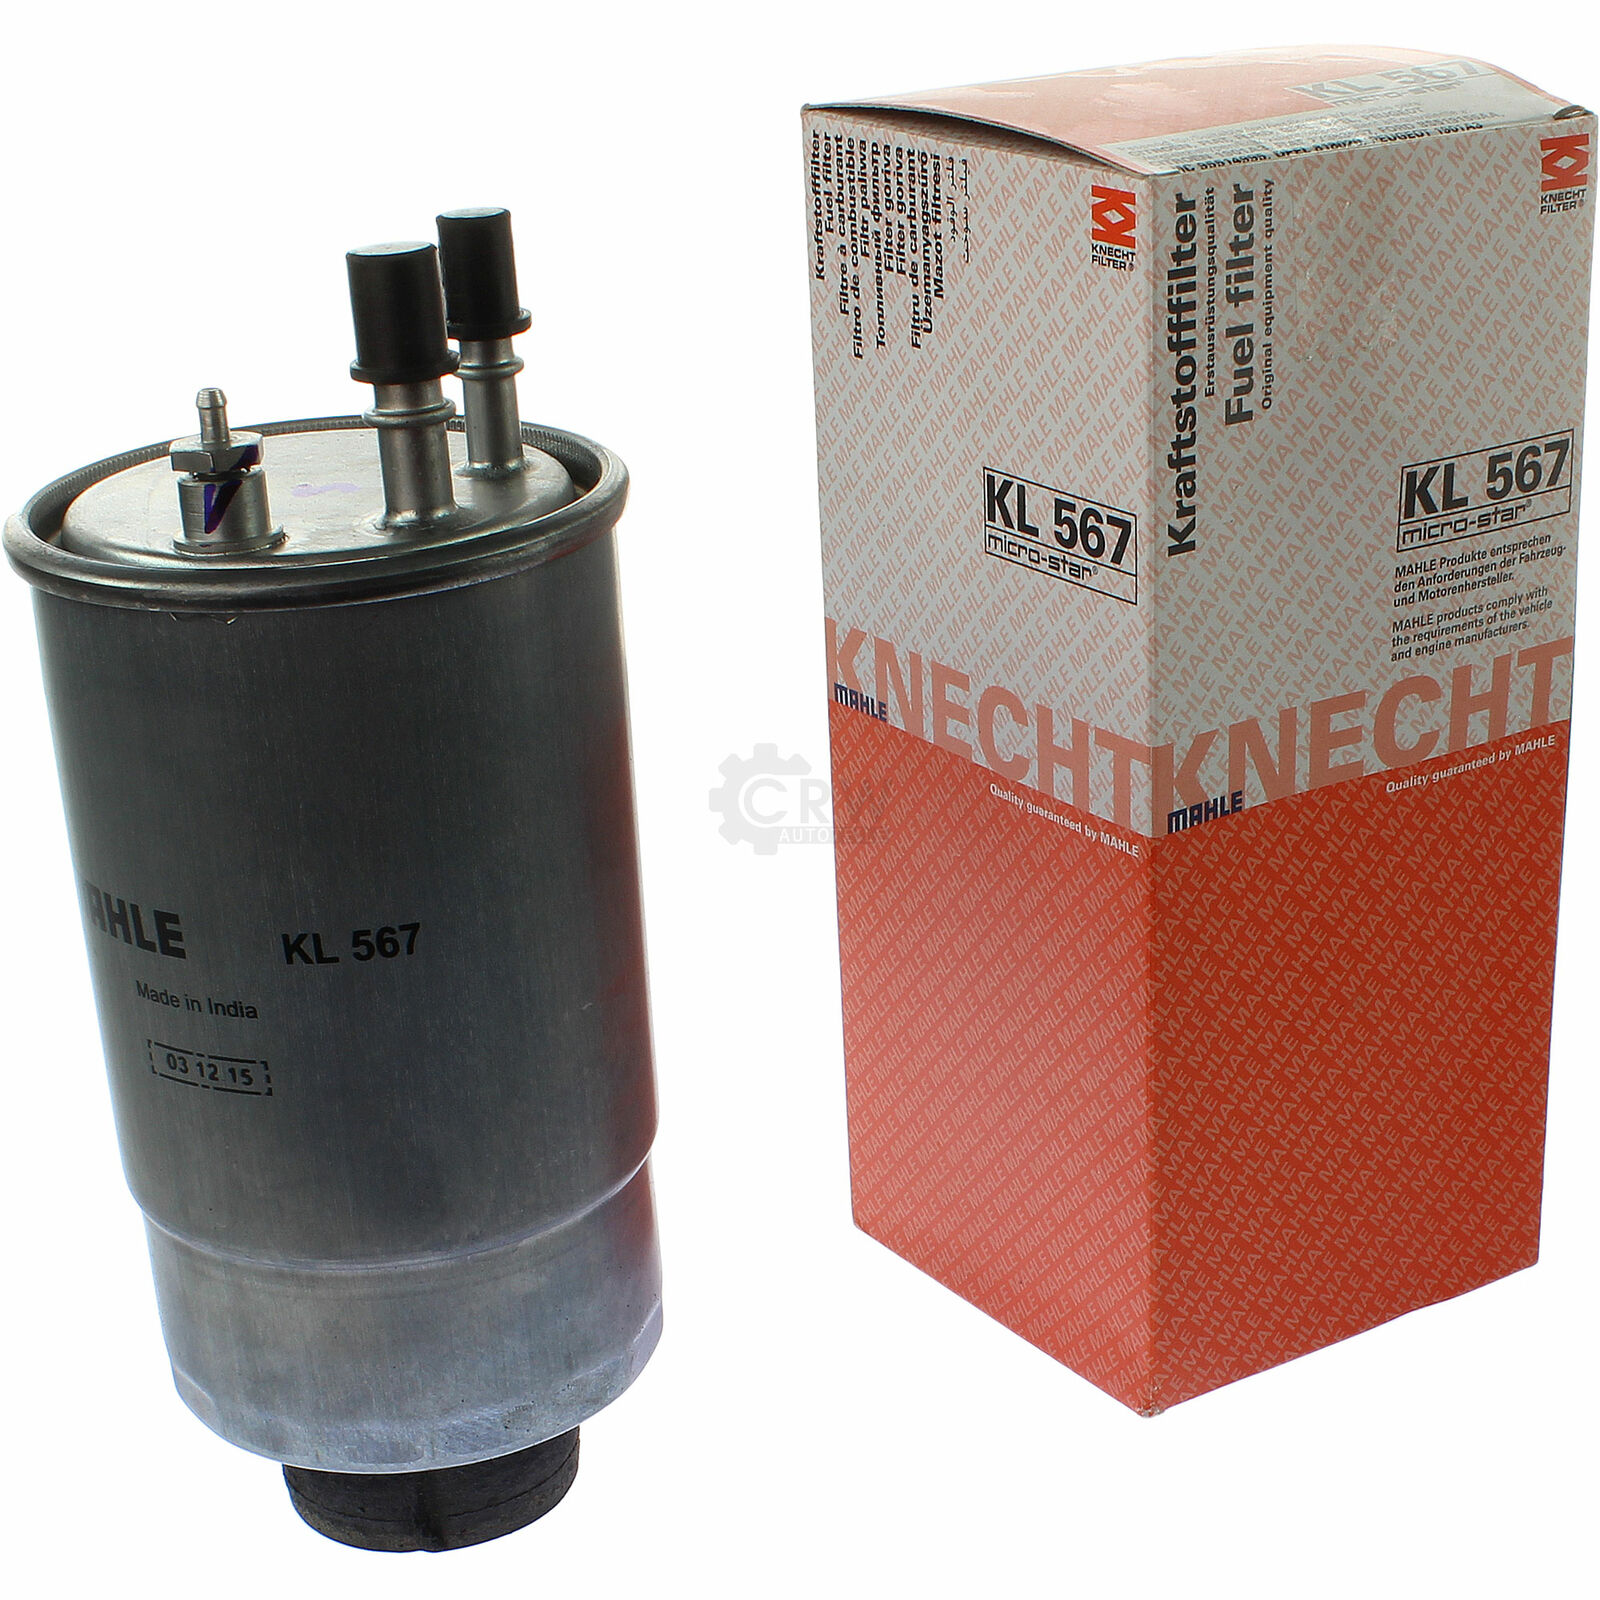 Knecht KL 567 Fuel Filter